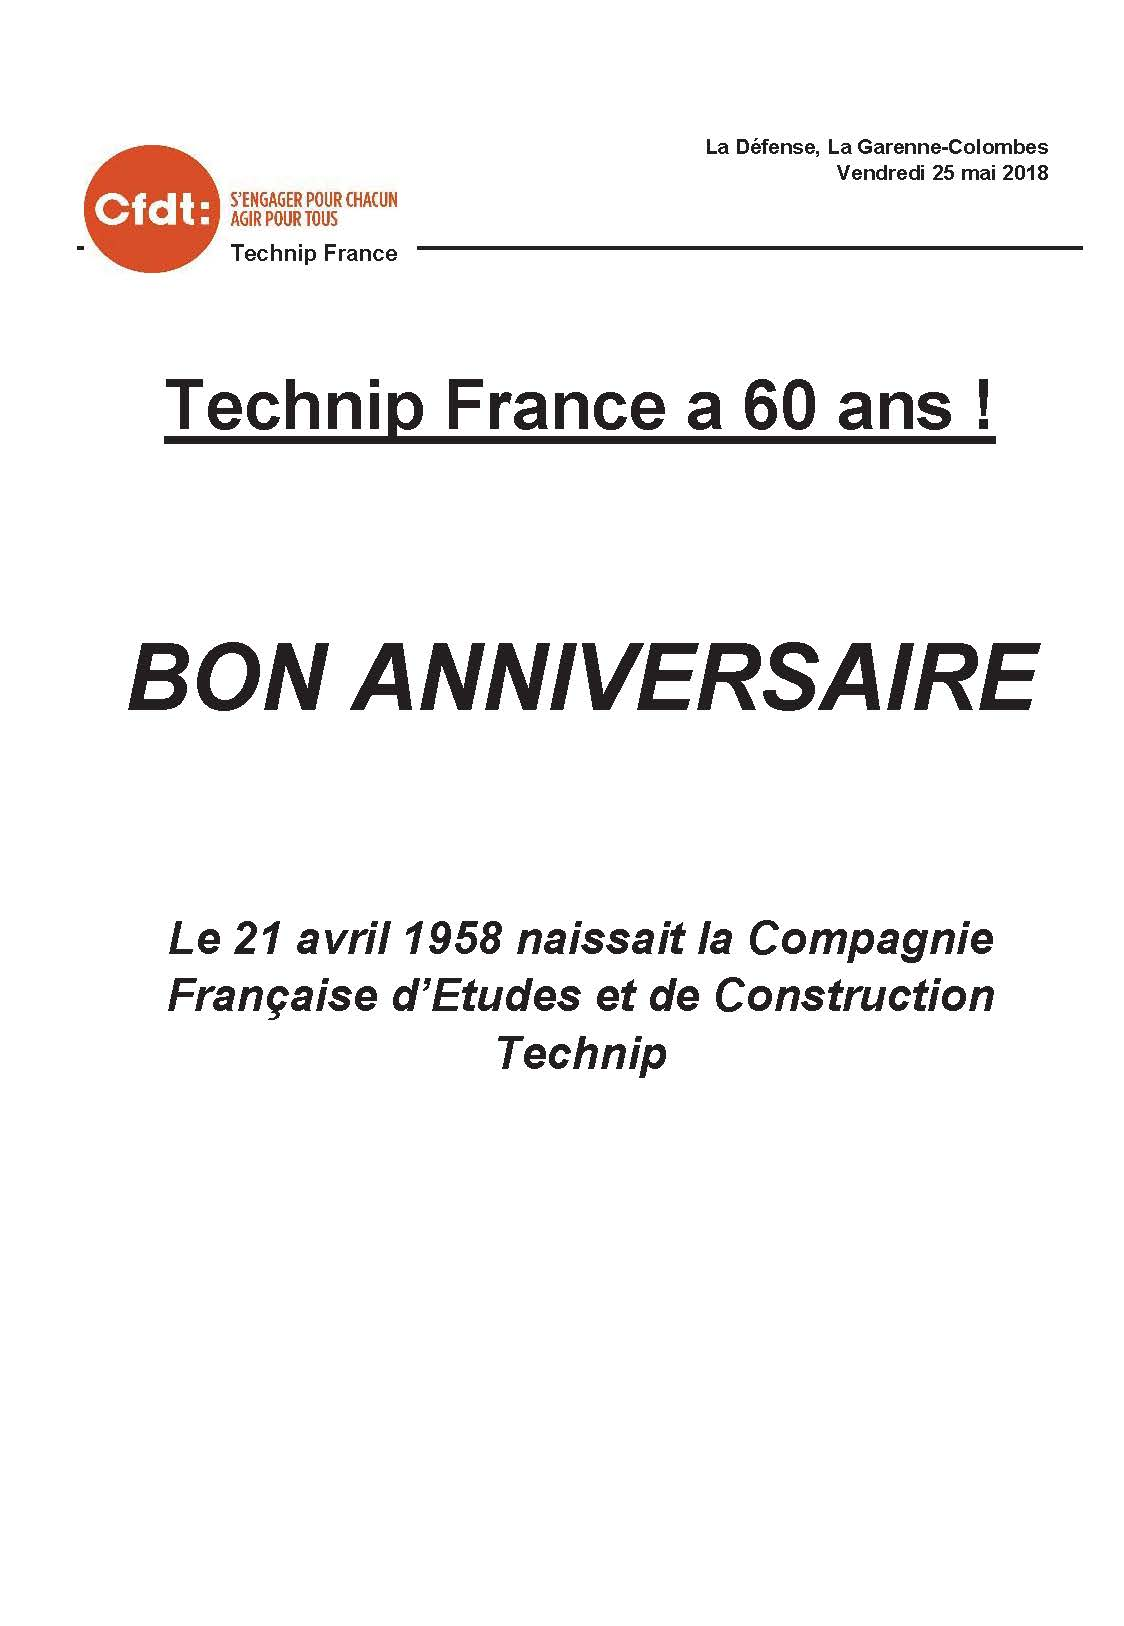 (2018-05-25) - TECHNIP FRANCE A 60 ANS ! BON ANNIVERSAIRE Tract_40